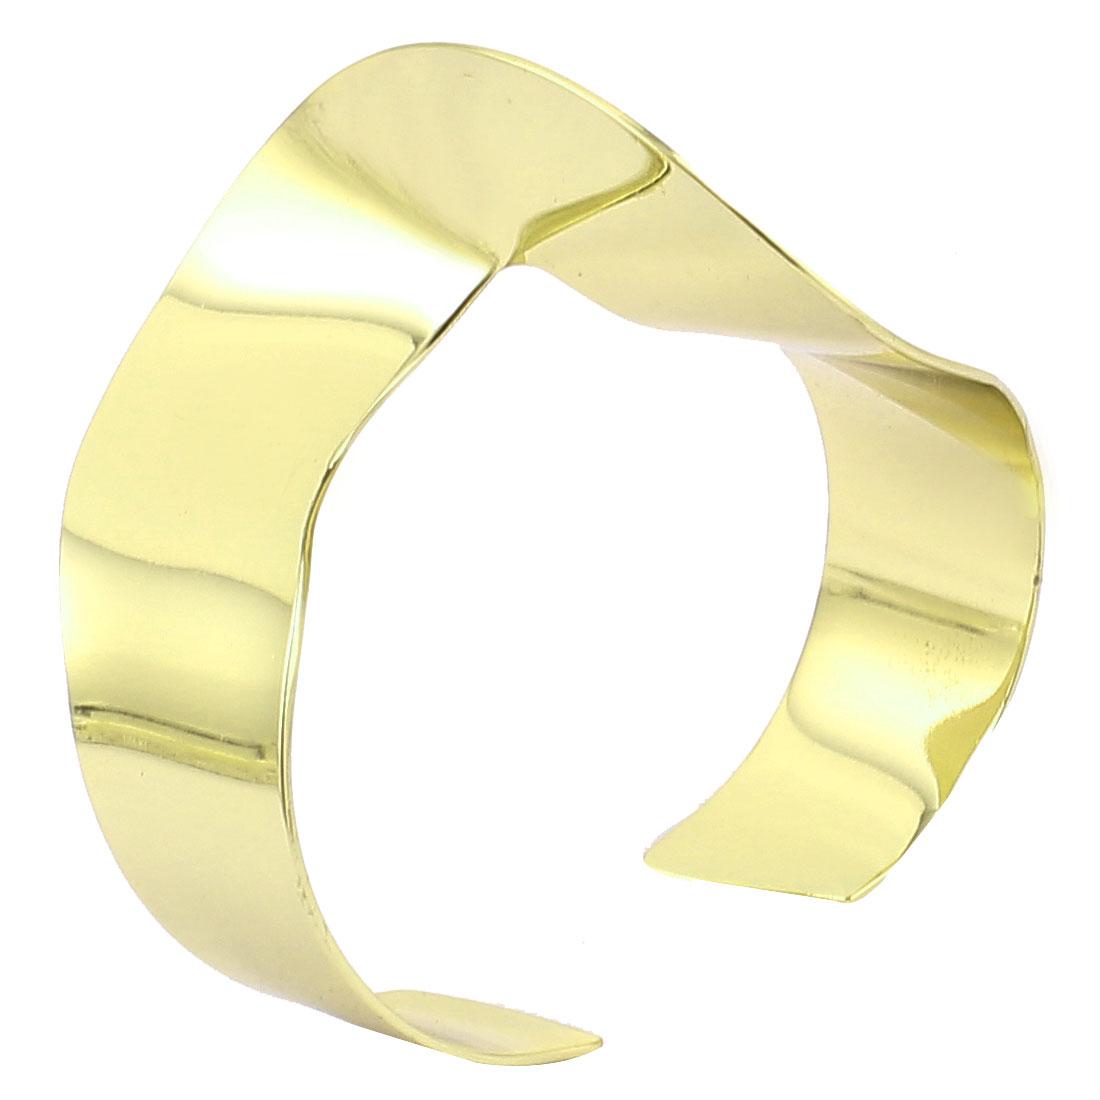 Unisex Copper Tone Metal Wide Cuff Twisted Shape Wrist Decoration Bracelet Bangle for Lady Women Men